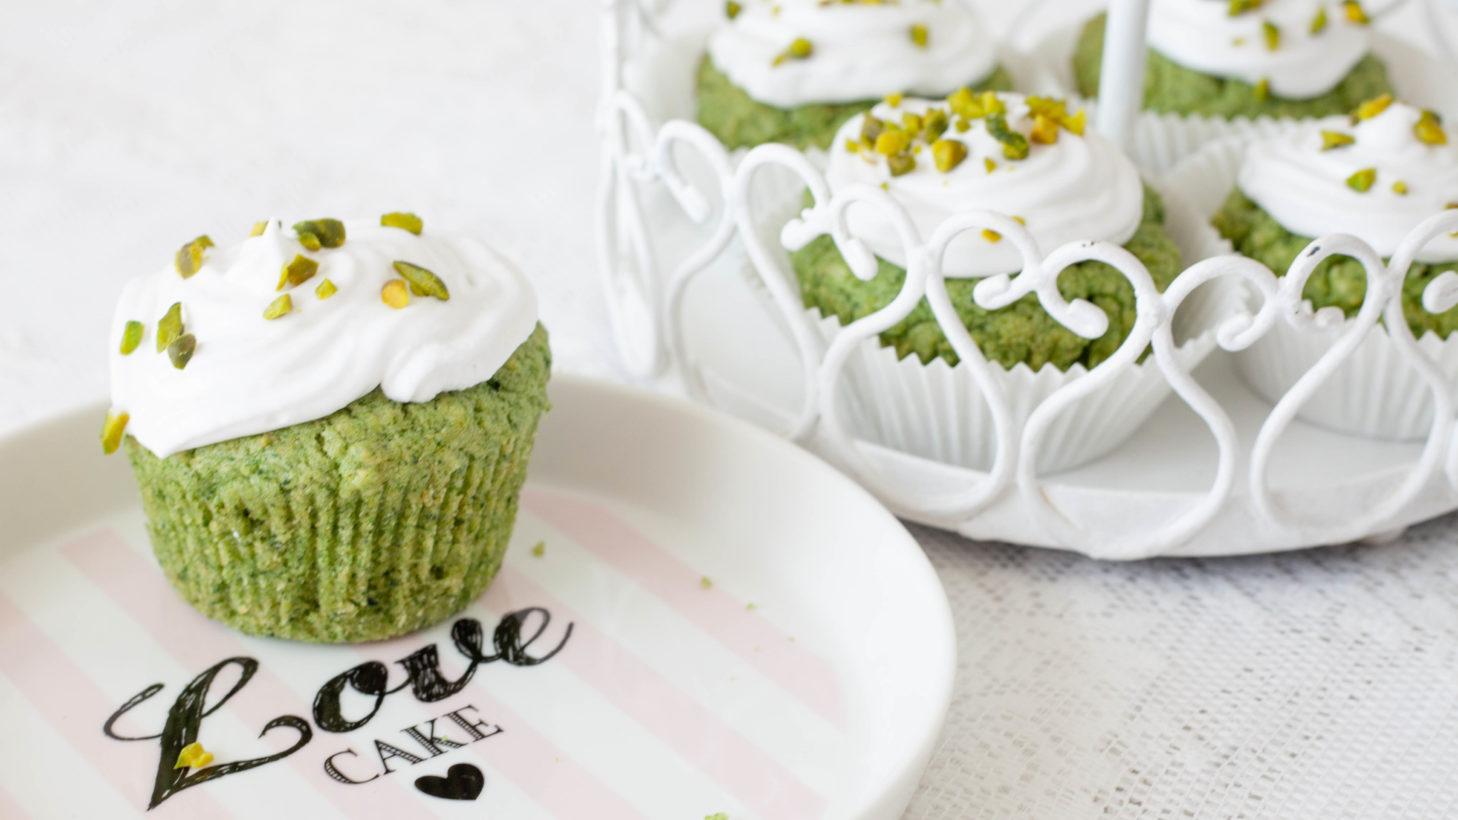 Spinat-Cupcakes mit Kokoshäubchen